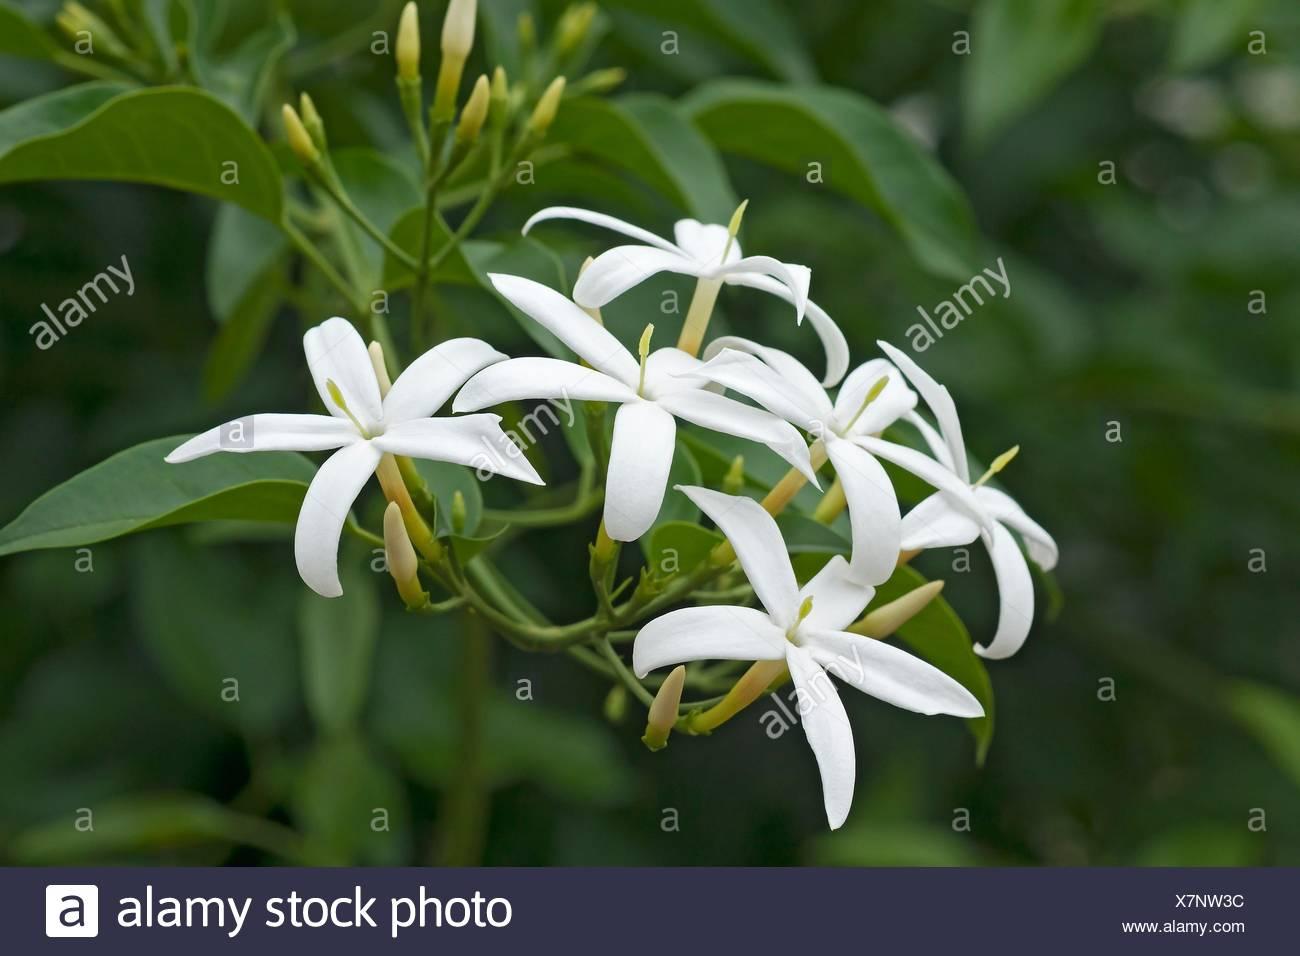 Twisted jasmine (Jasminum tortuosum). Called African jasmine and Perfume jasmine also. - Stock Image